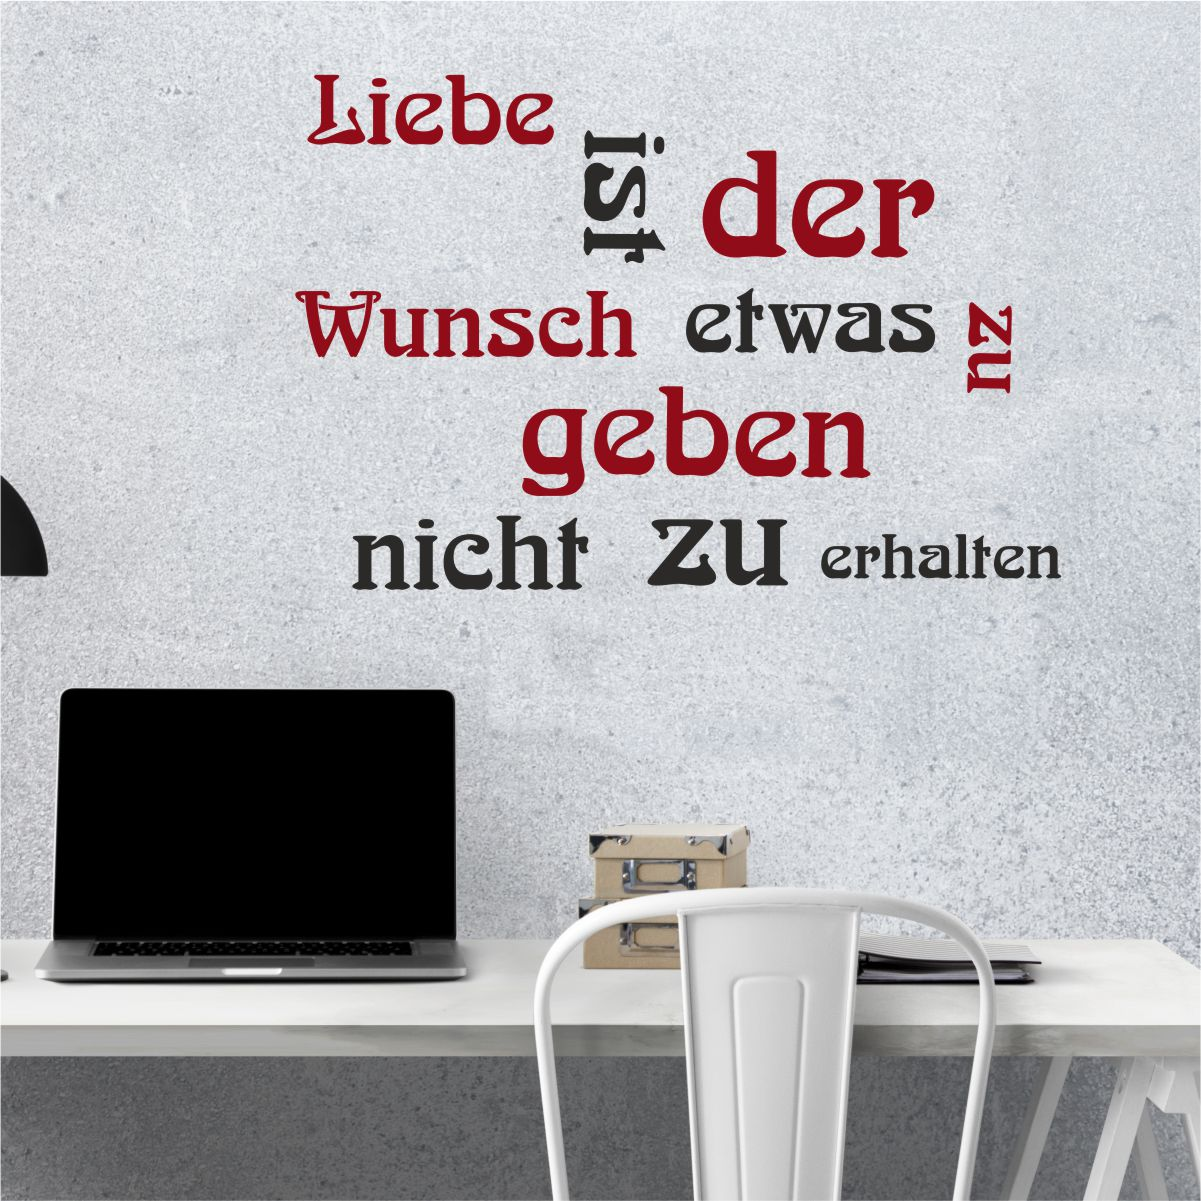 Full Size of Wandsprüche Englisch Wandsprüche Selber Machen Wandsprüche Selber Gestalten Wandsprüche Schablonen Küche Wandsprüche